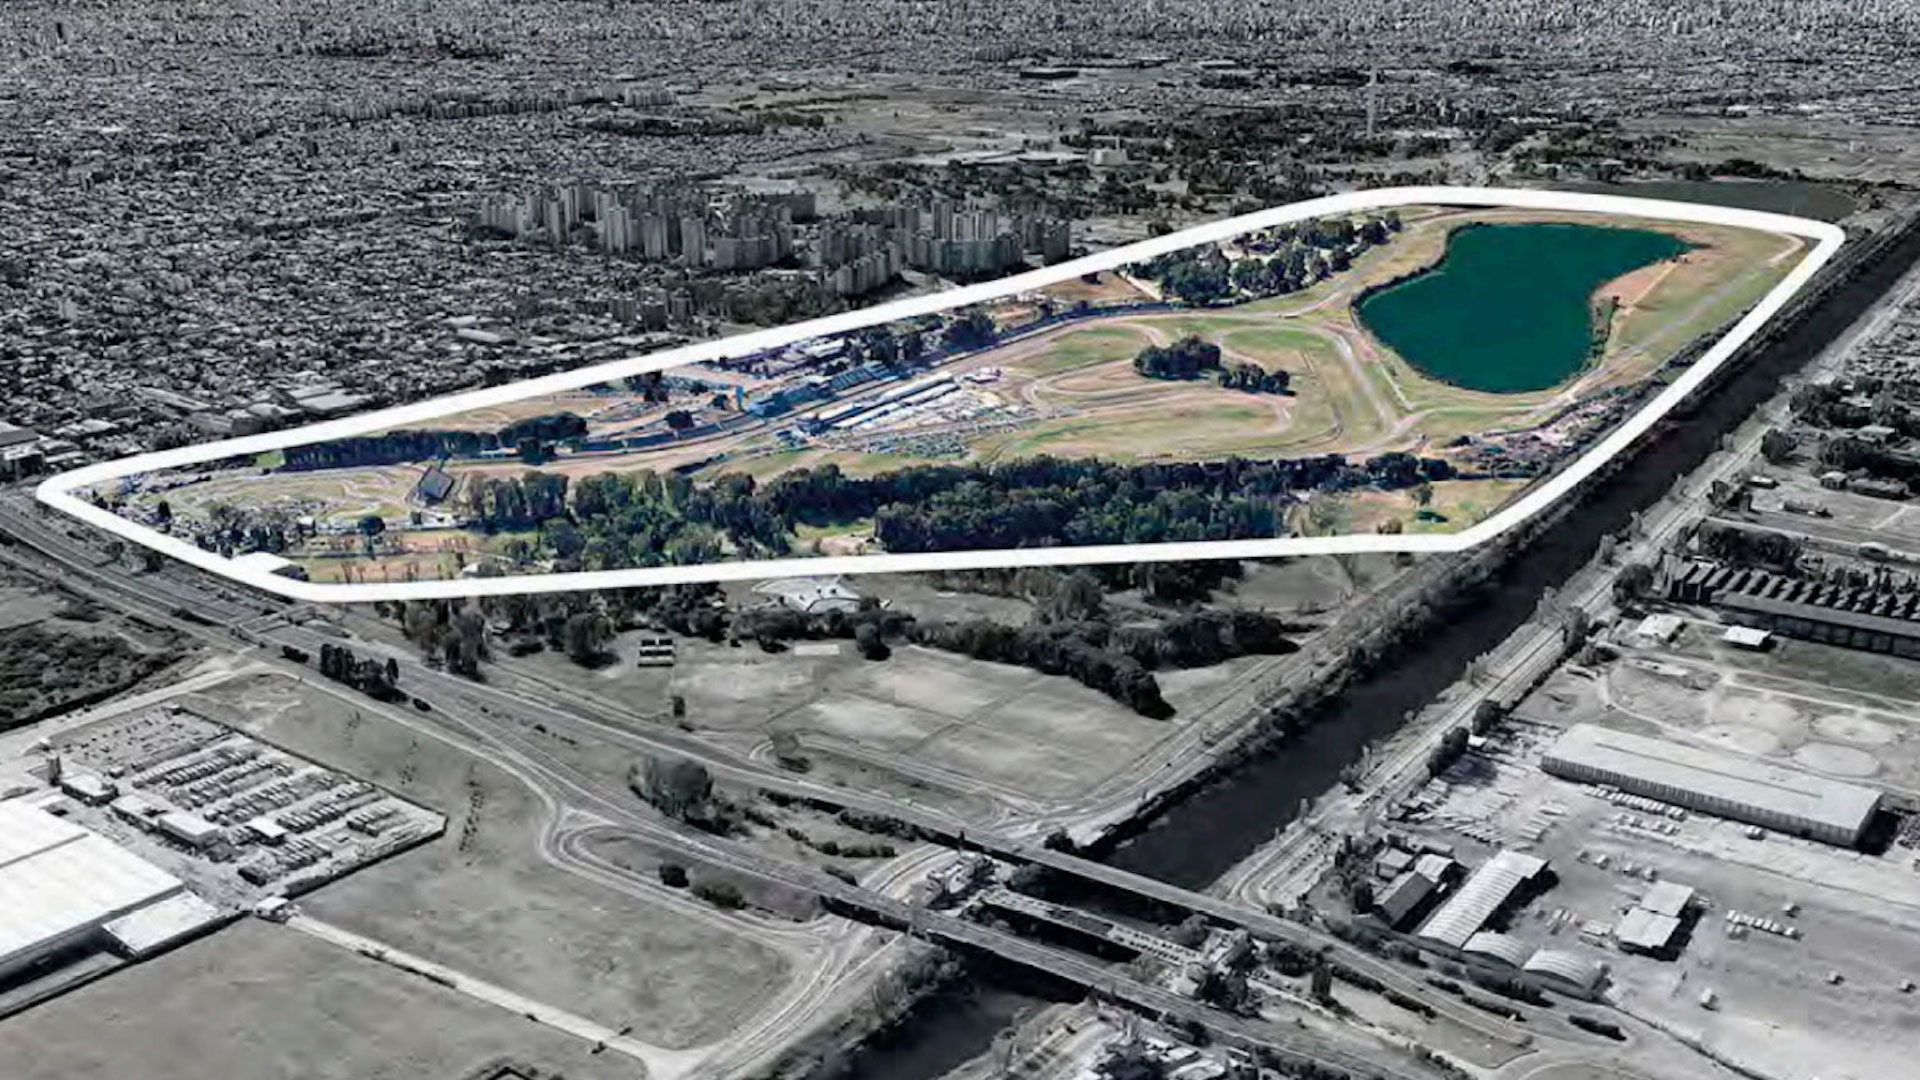 autodromo-buenosaires-01022017.jpg